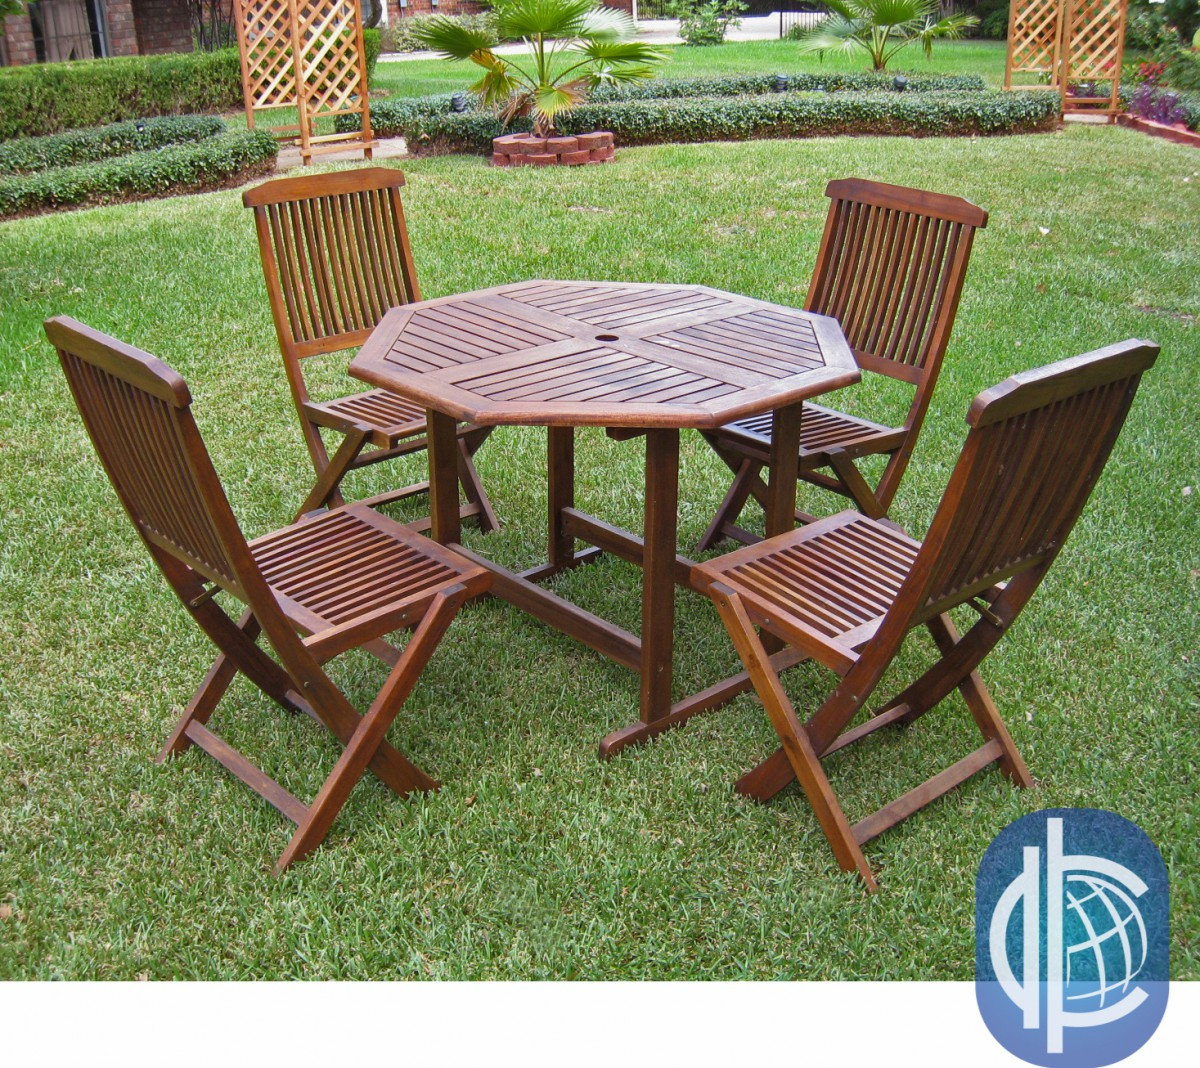 Acacia 5 Piece Stowaway Patio Furniture Set Patio Table